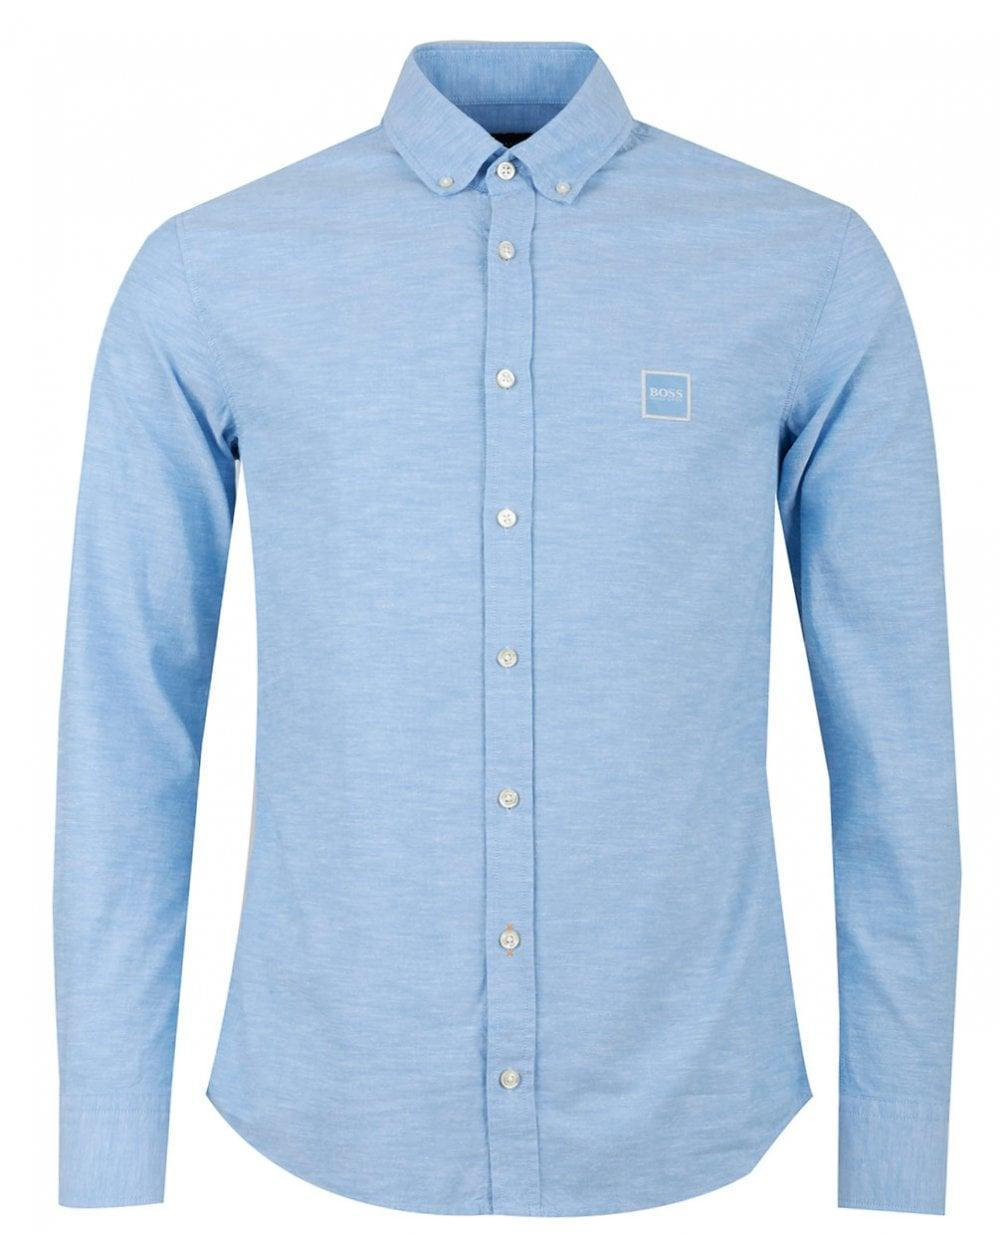 21d2834fd BOSS - Blue Casual Mabsoot Slim Fit Oxford Logo Shirt for Men - Lyst. View  fullscreen